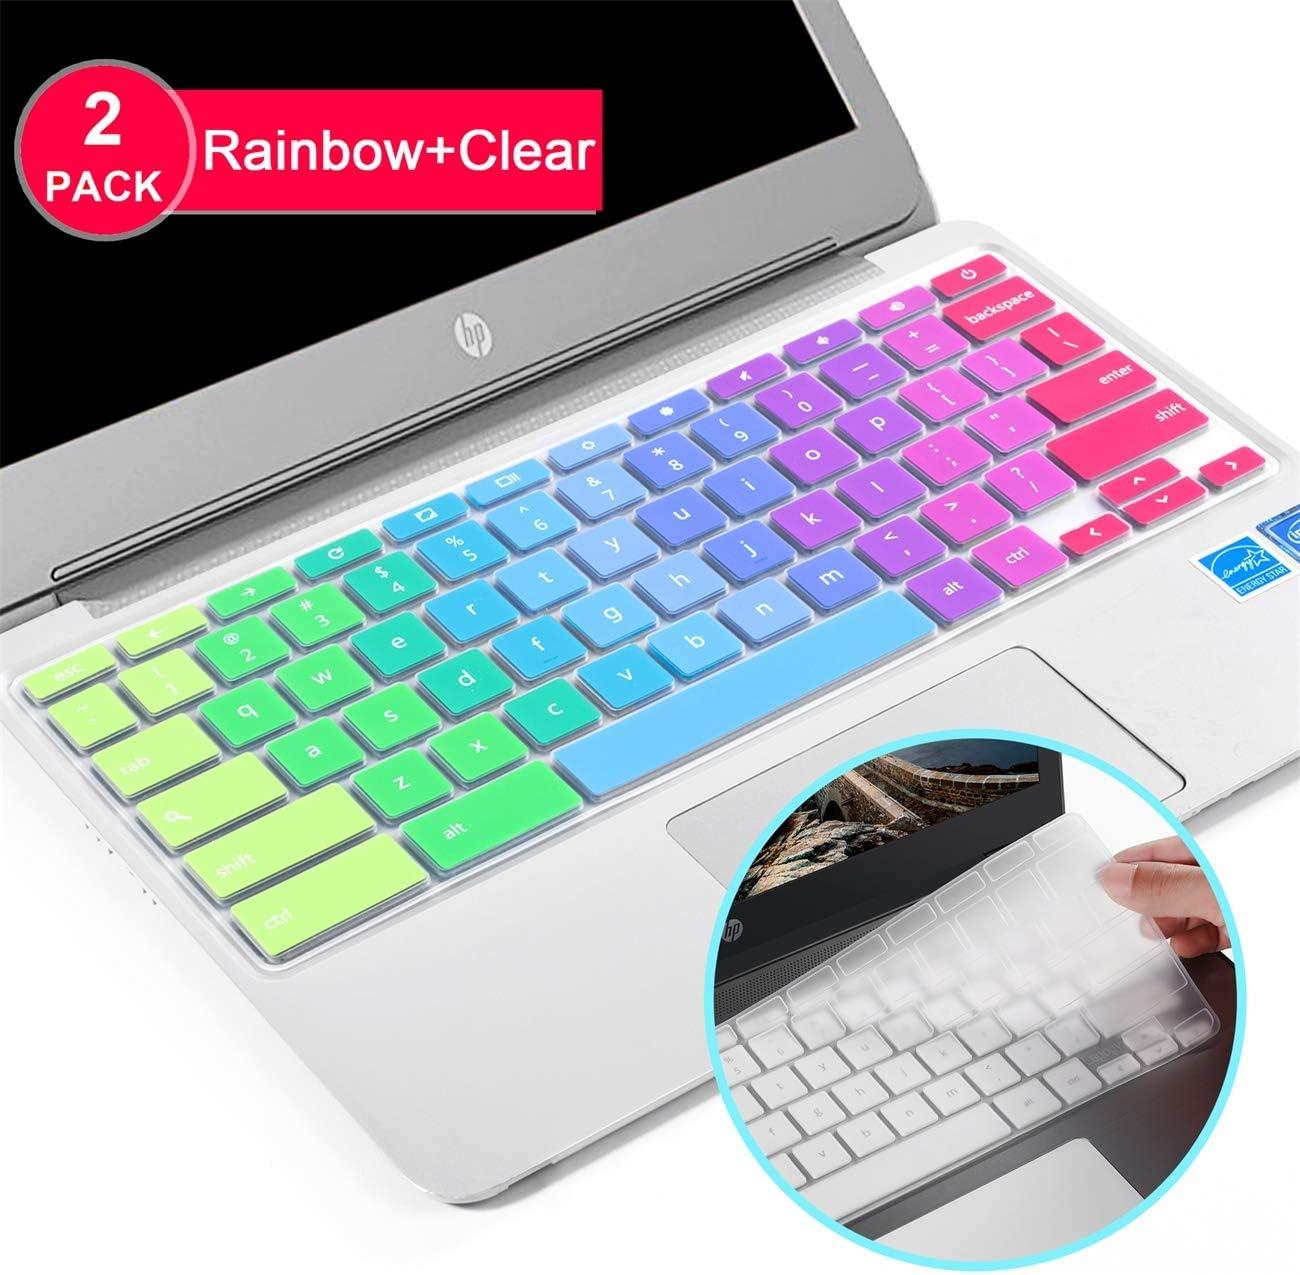 "Lapogy[2pcs] Premium Ultra Thin Keyboard Cover Skin for ASUS Chromebook Flip C434TA-DSM4T 2-in-1 Laptop 14"" Touchscreen,C434,C434TA/C425TA/C433TA,ASUS C434TA Accessories(Clear) Rainbow+TPU"